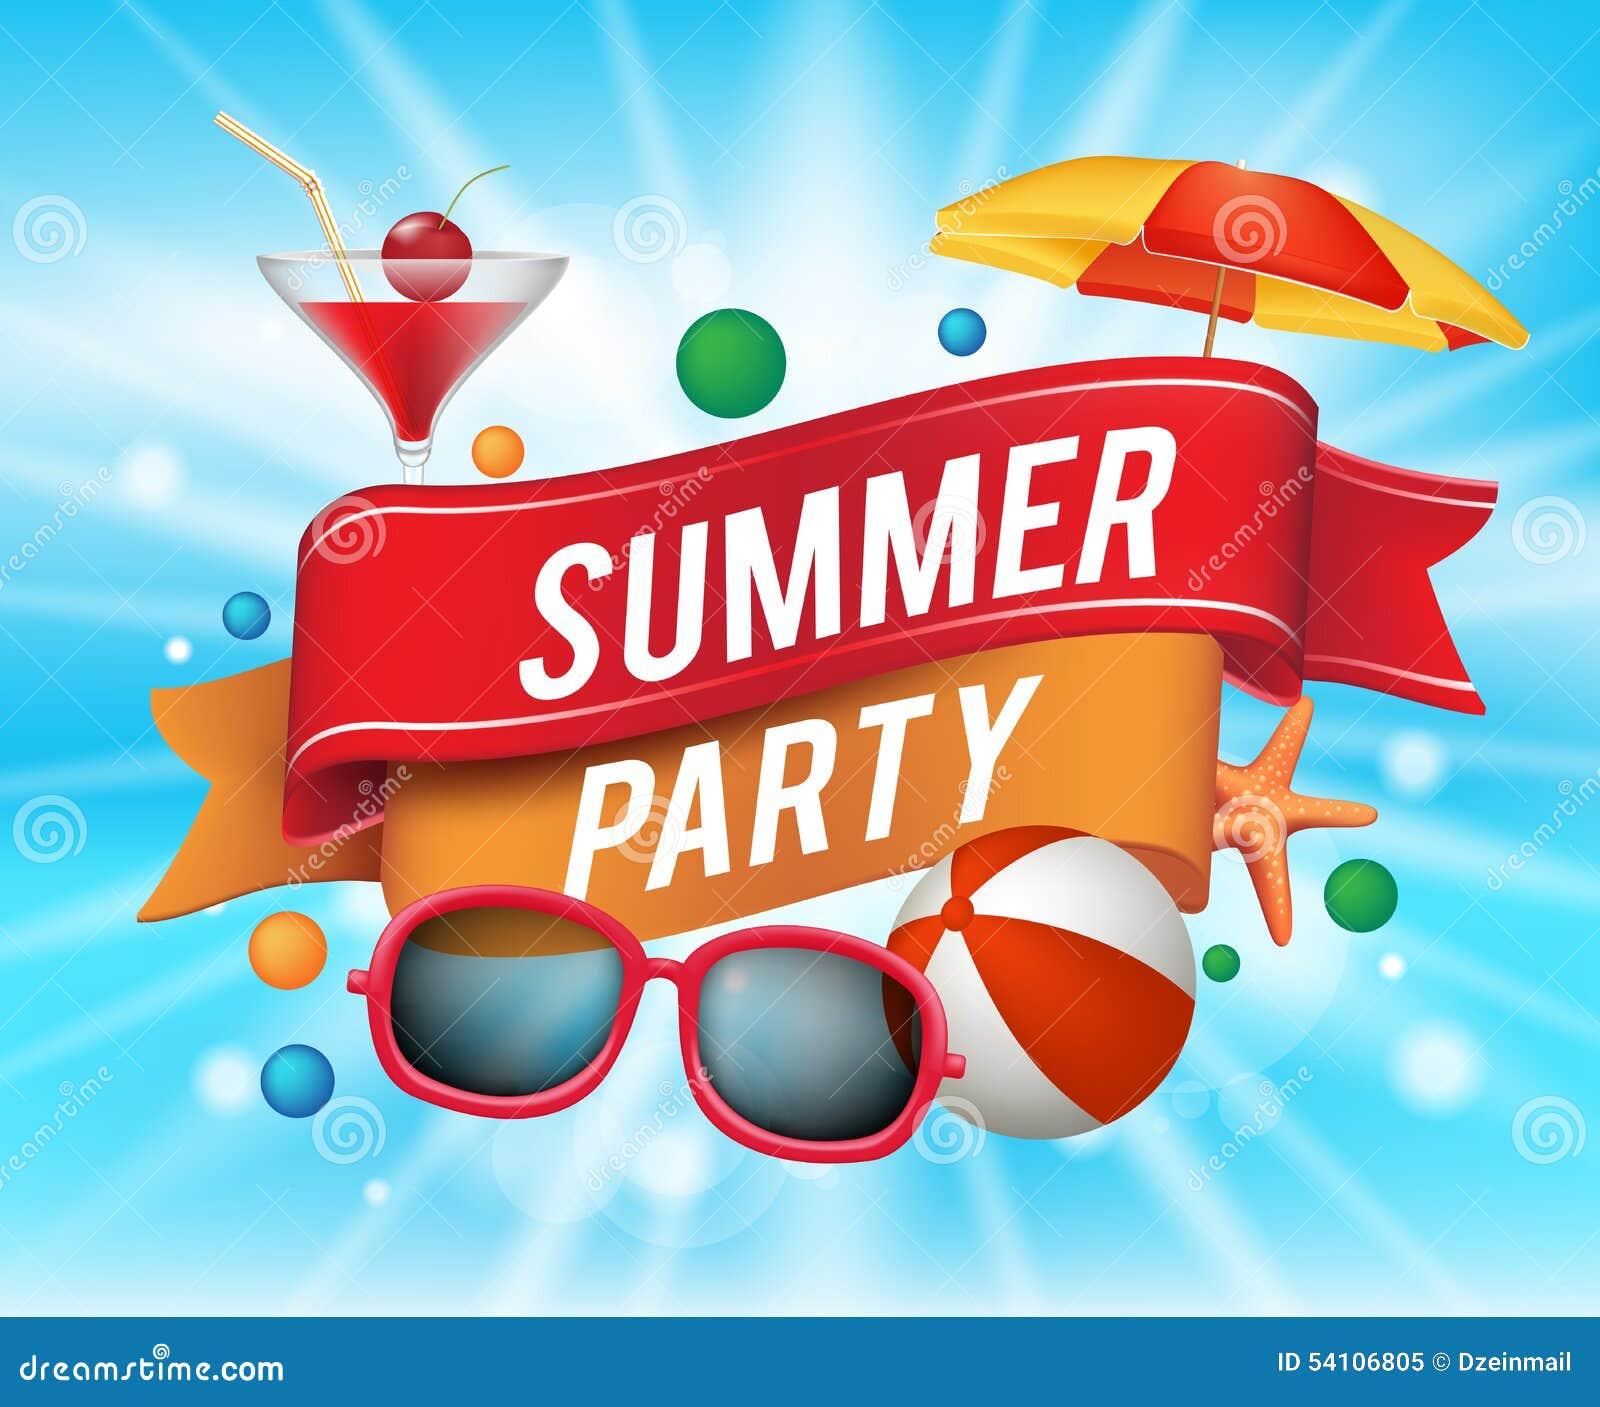 Sommerfest-Plakat Mit Bunten Elementen Vektor Abbildung - Bild: 54106805